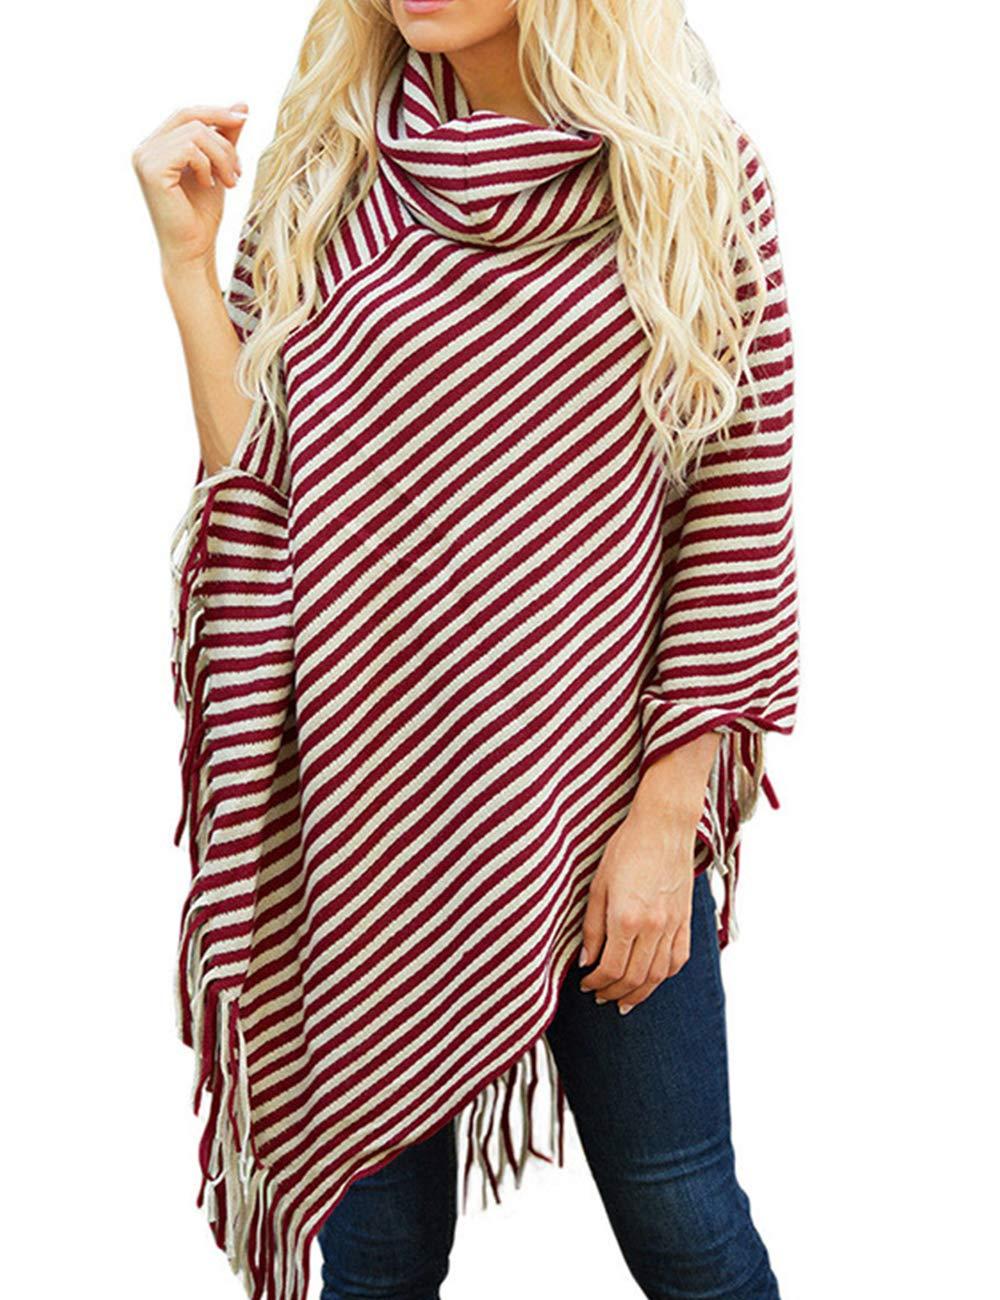 Sexyshine Women's Fall Loose Turtleneck Stripe Tassel Shawl Wrap Poncho Cape Cloak Pullover Sweater Tops,WR